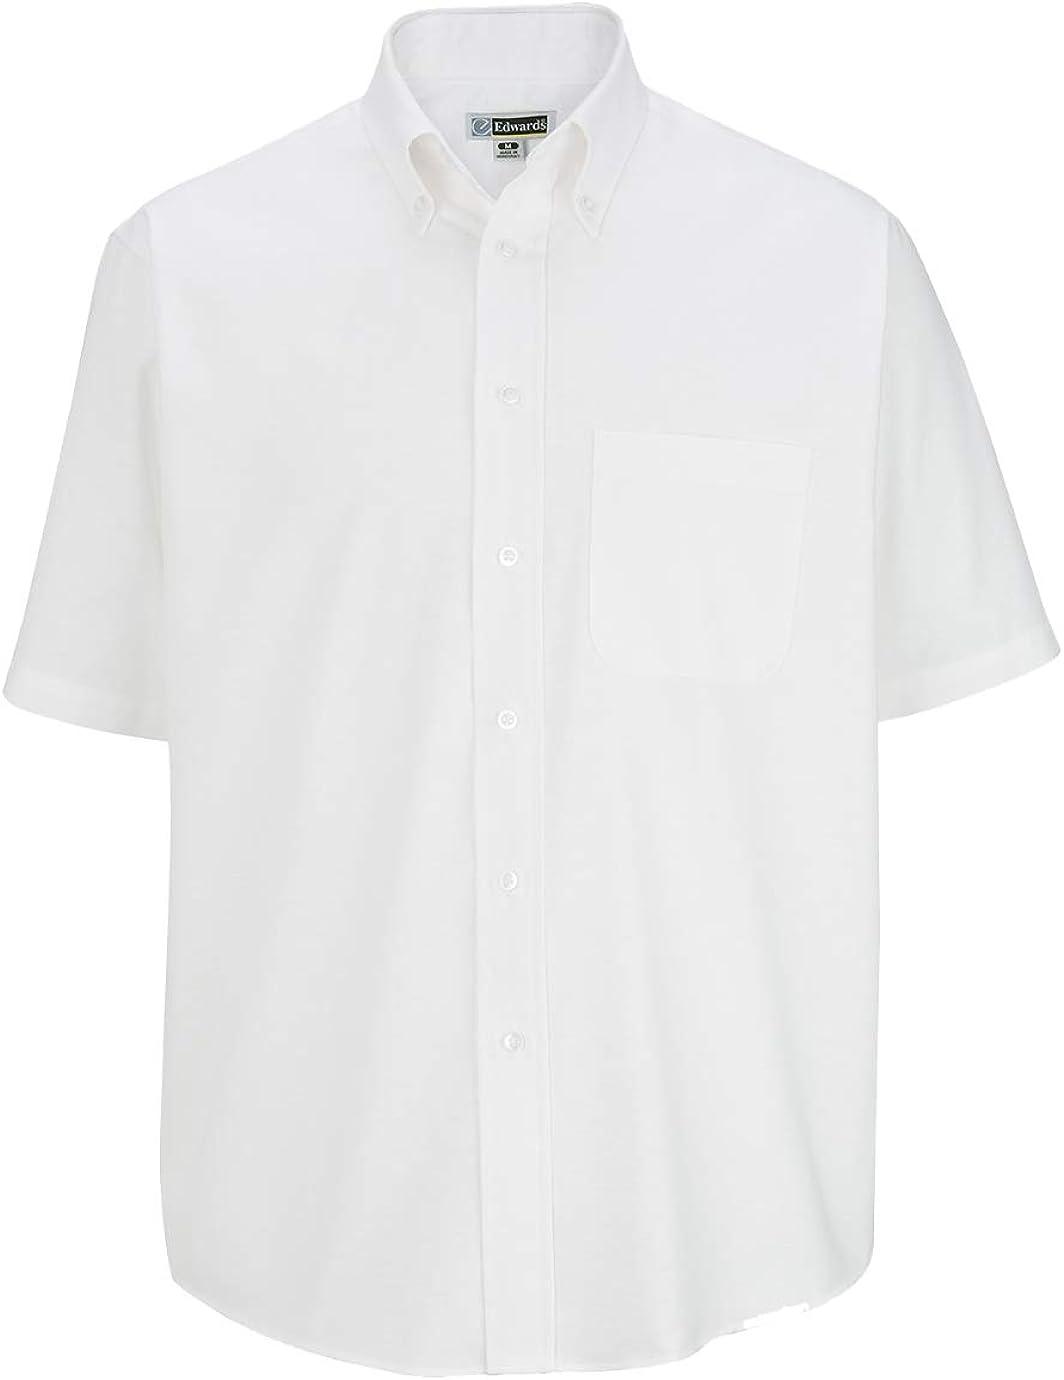 Edwards Men's Short Sleeve Oxford Shirt 5XL Tall White